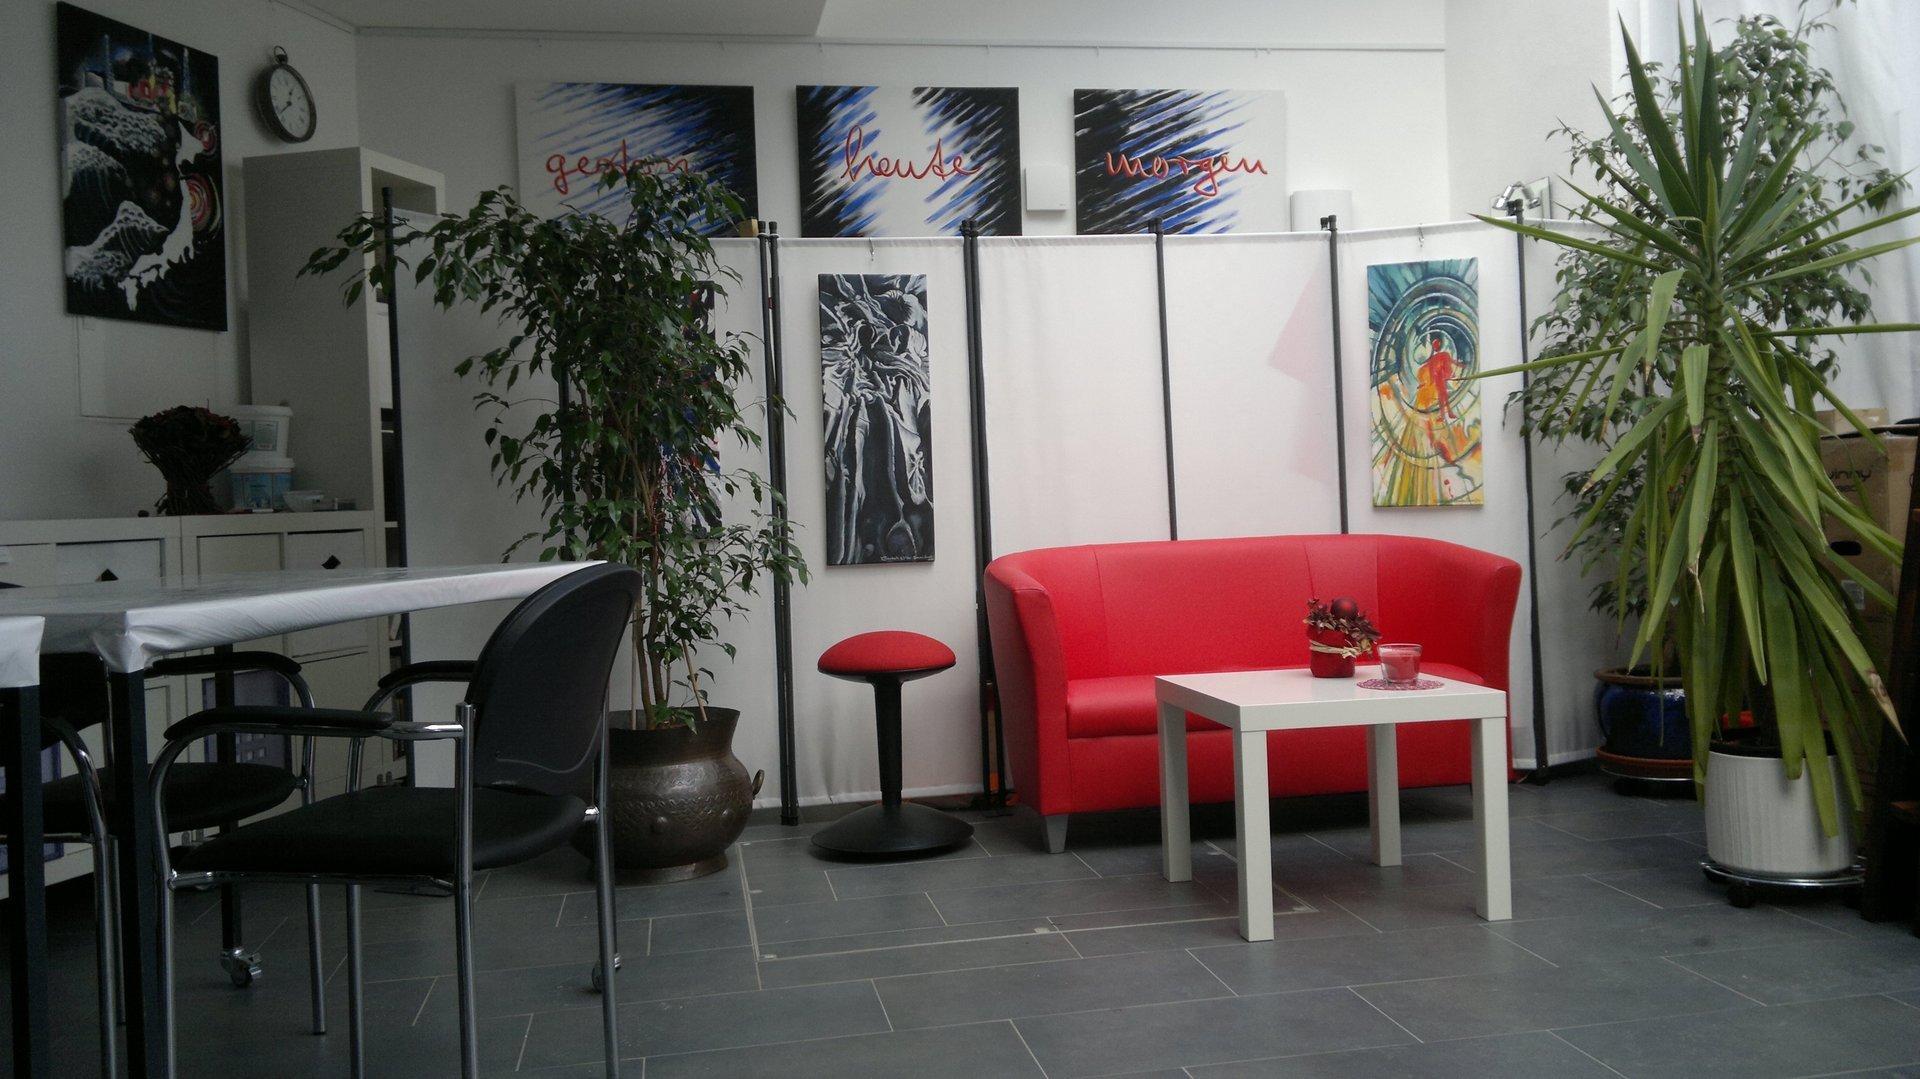 Kunstatelier, Galerie, augsburg, Malerei, Figuren, Beton, Keramik